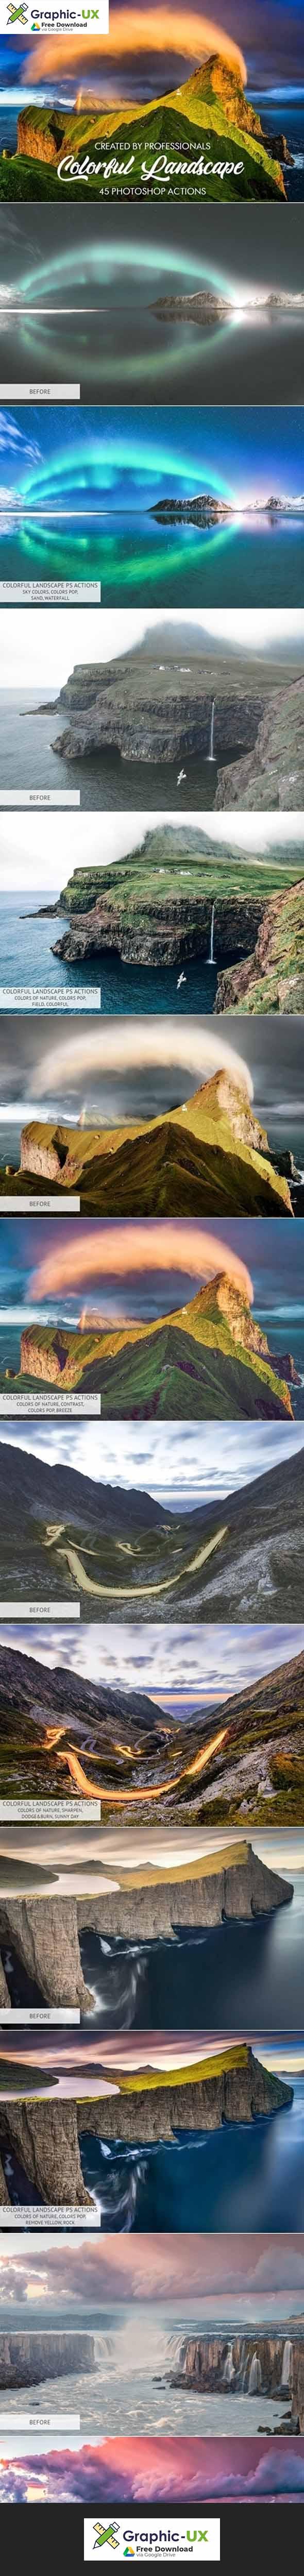 Colorful Landscape Photoshop Actions Free Graphicux